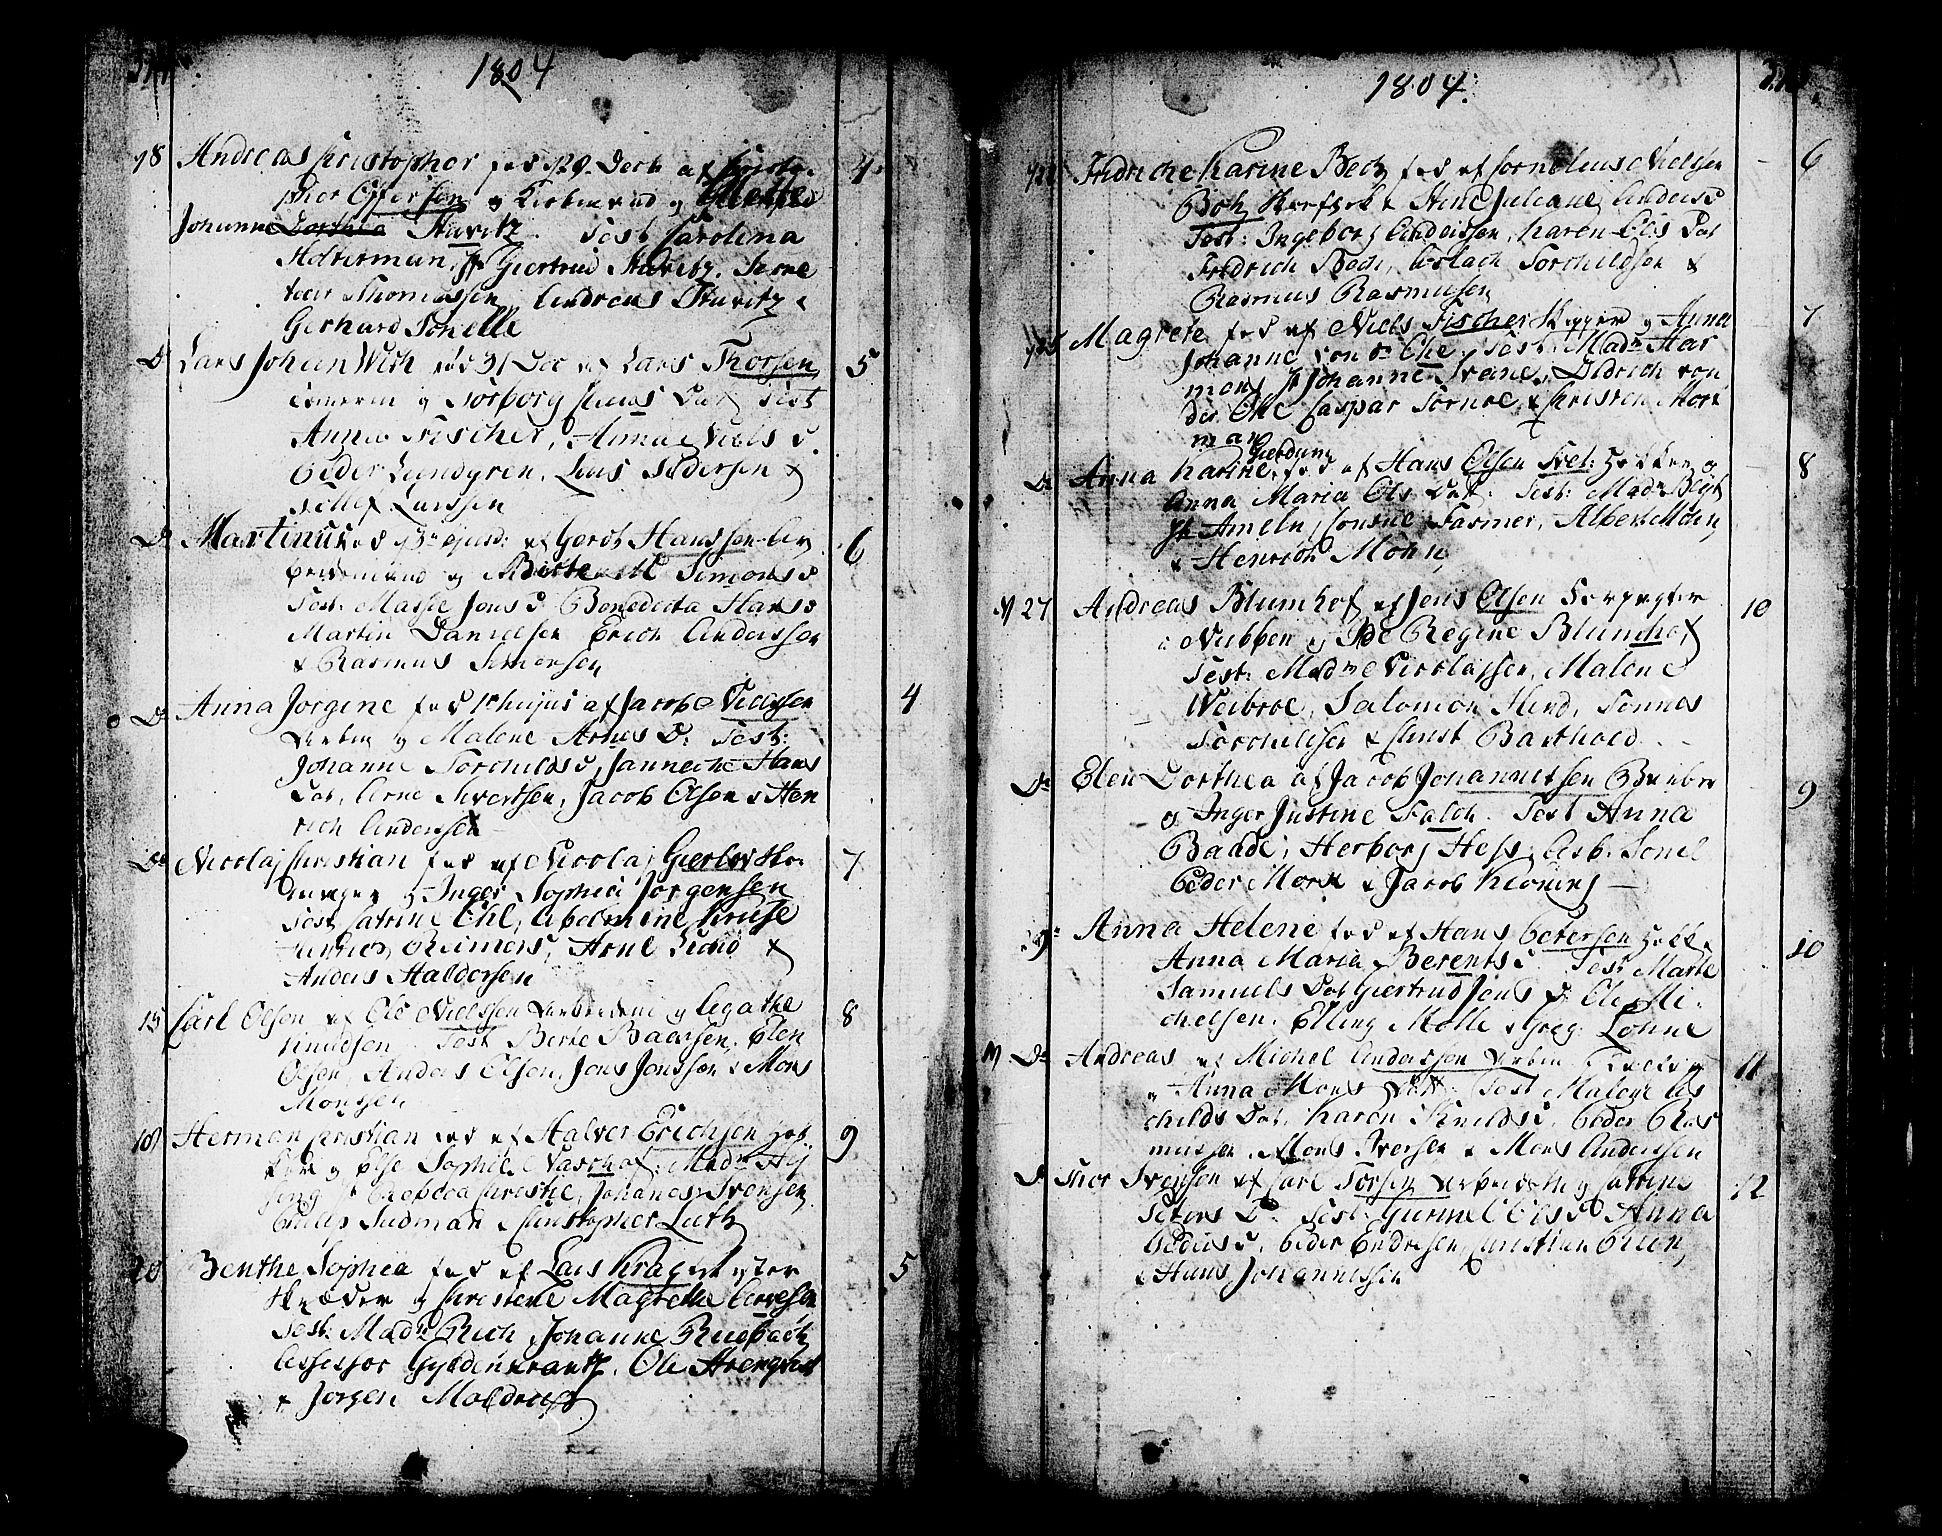 SAB, Domkirken sokneprestembete, H/Haa/L0004: Ministerialbok nr. A 4, 1763-1820, s. 314-315